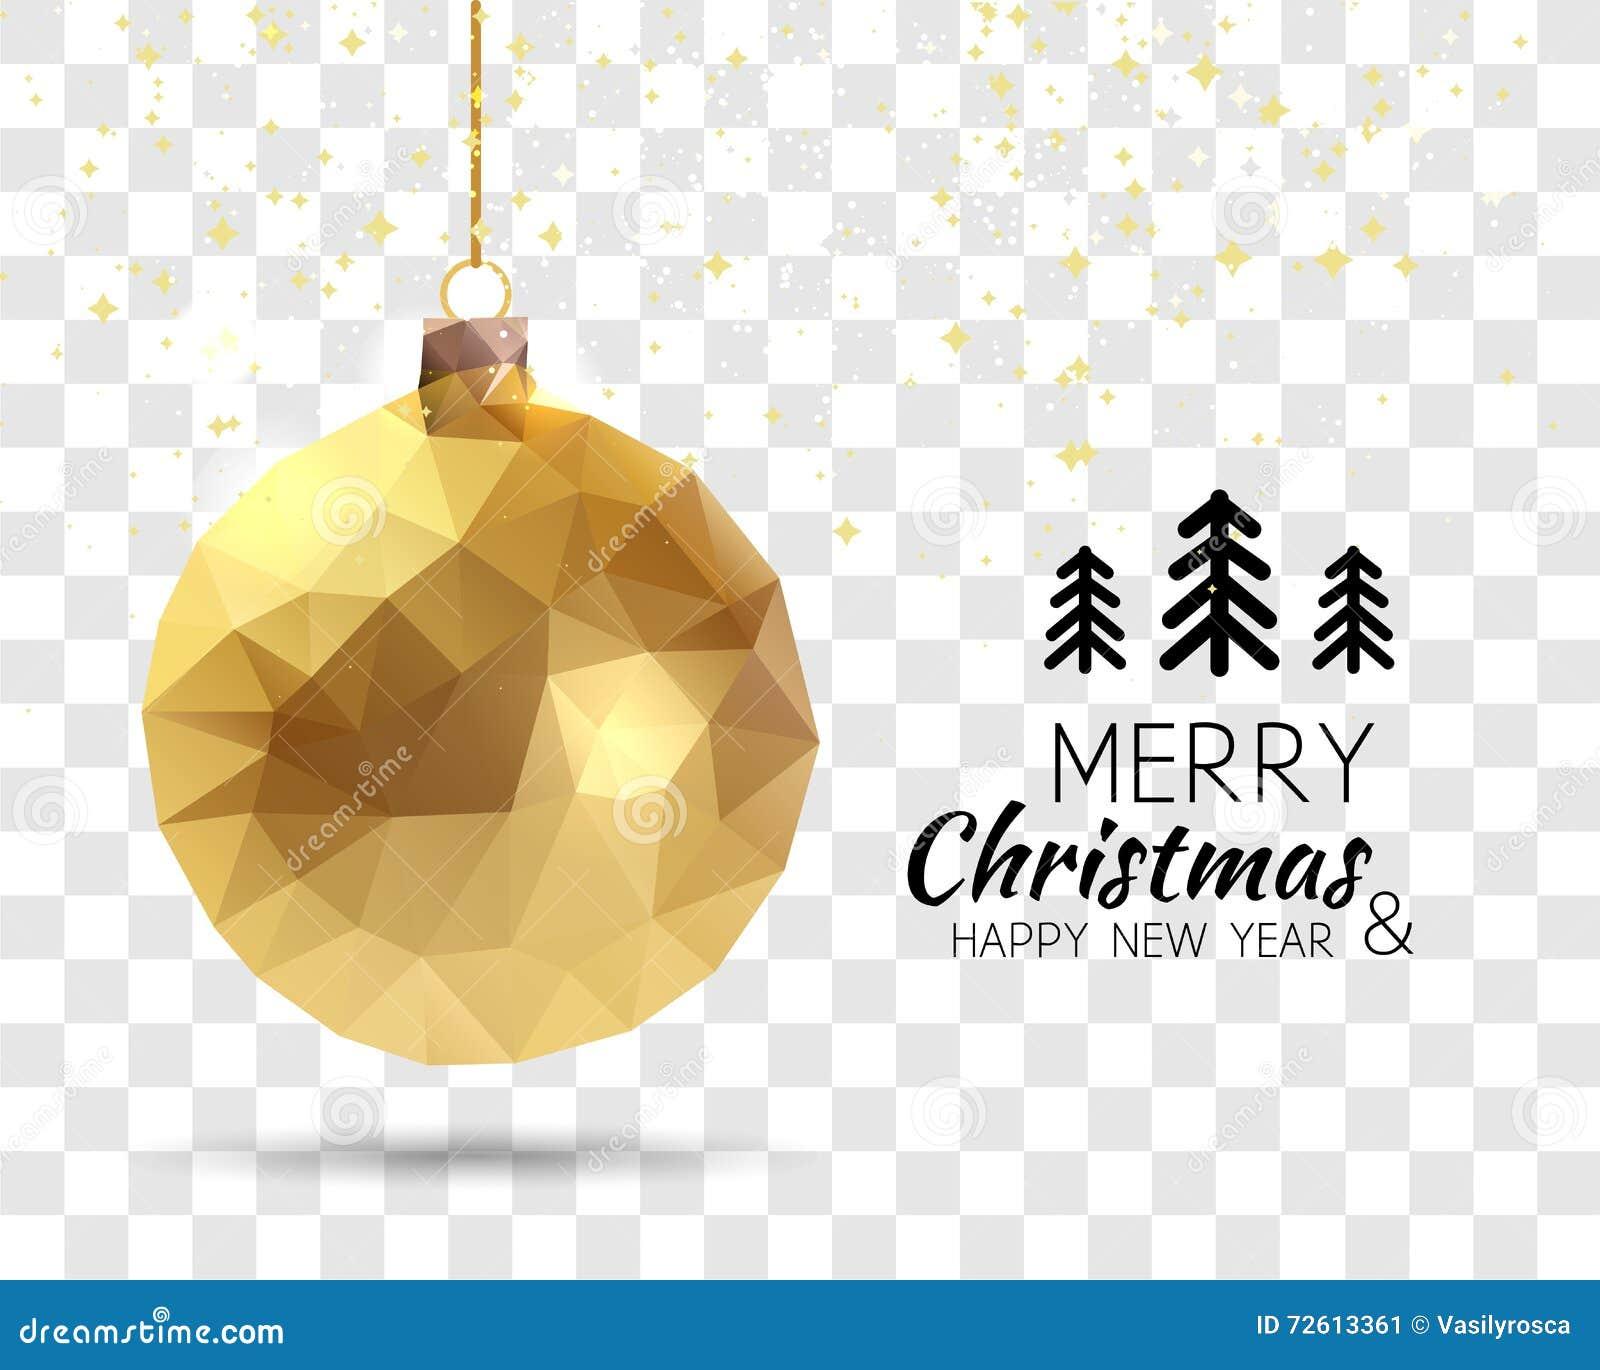 Merry Christmas Happy New Year Trendy Triangular Gold Xmas Ball ...